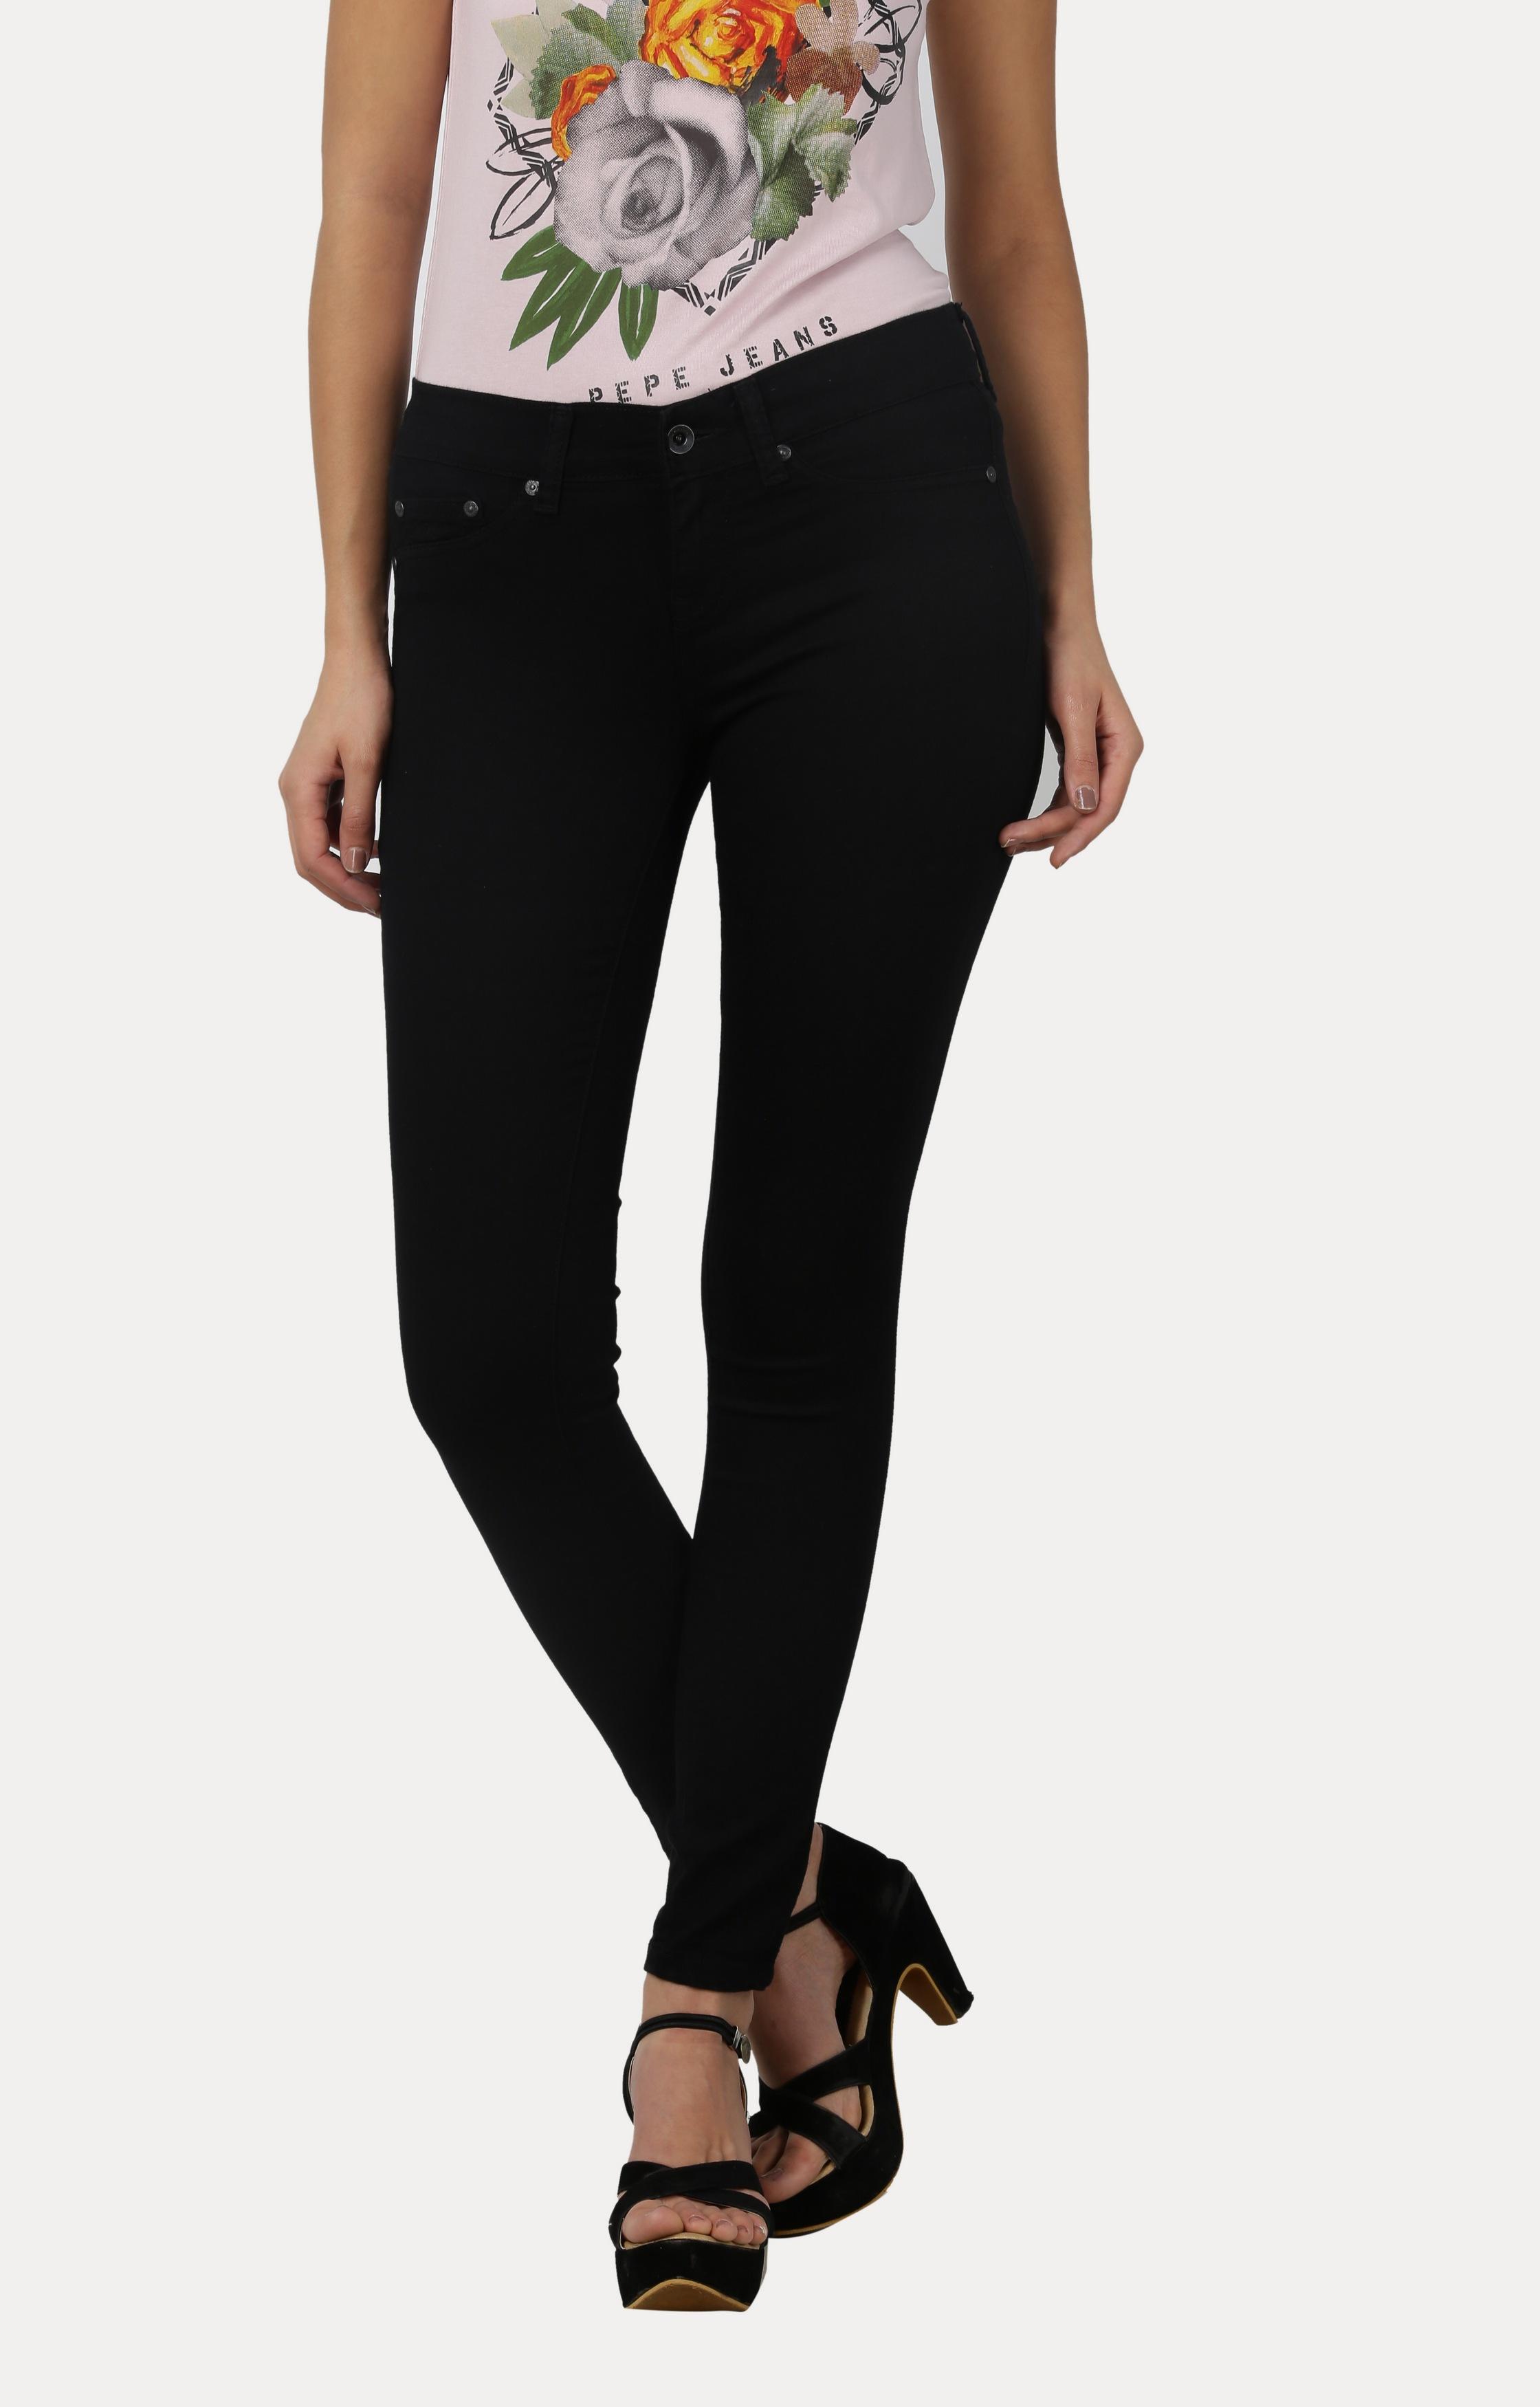 Pepe Jeans | JEGGING.3_BLACK